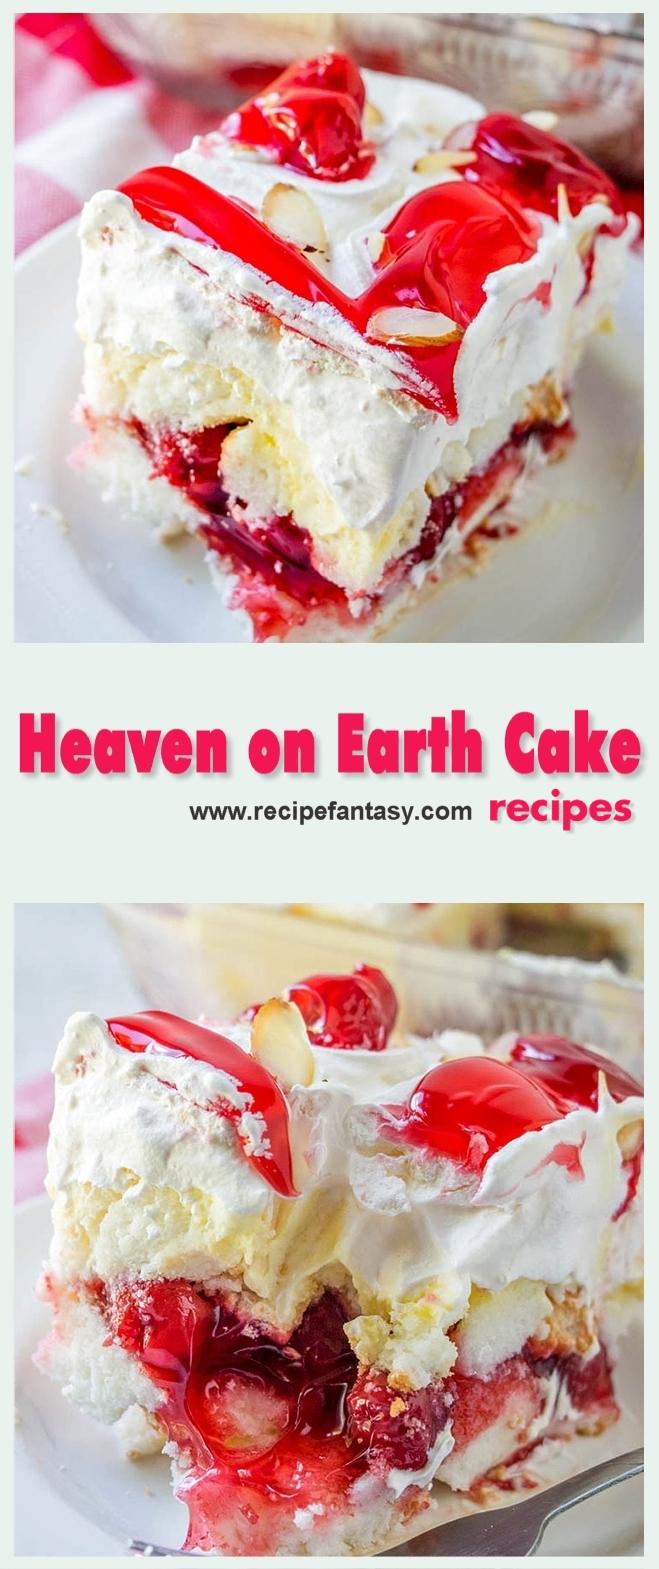 Heaven on Earth Cake Recipes 2019